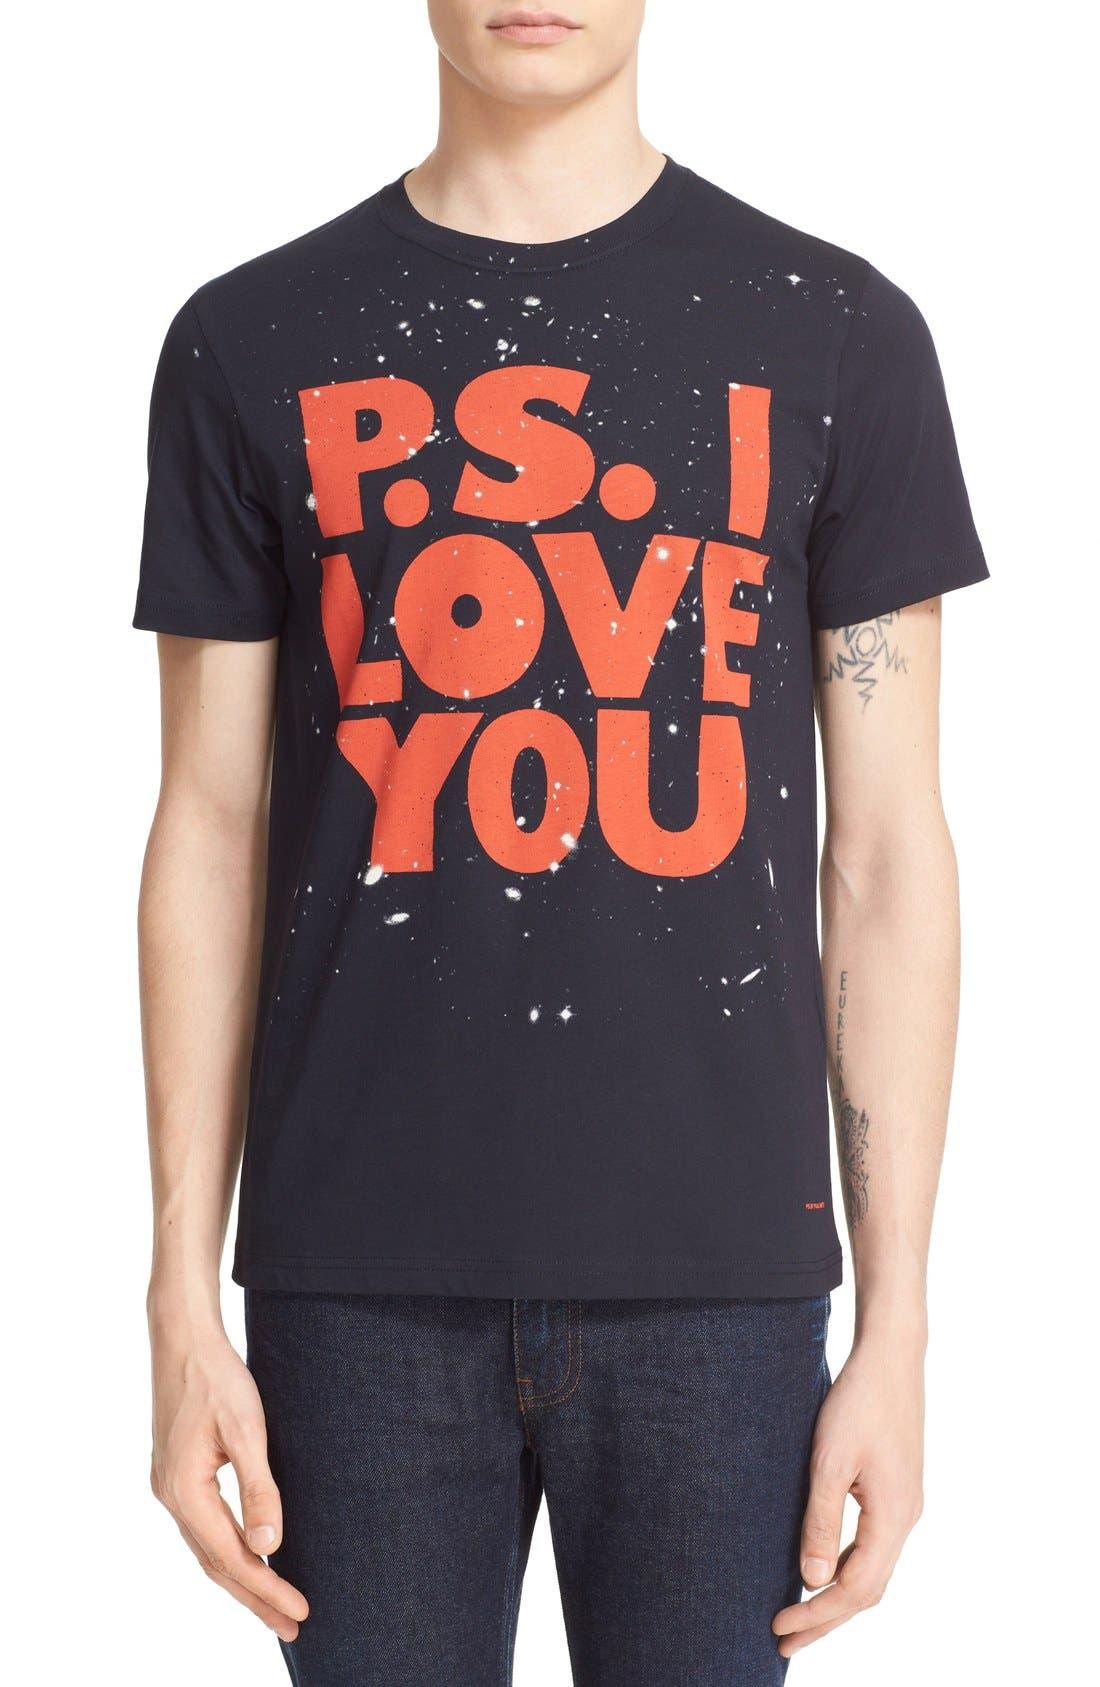 Paul Smith 'P.S. I Love You' Graphic Cotton T-Shirt,                             Main thumbnail 1, color,                             414